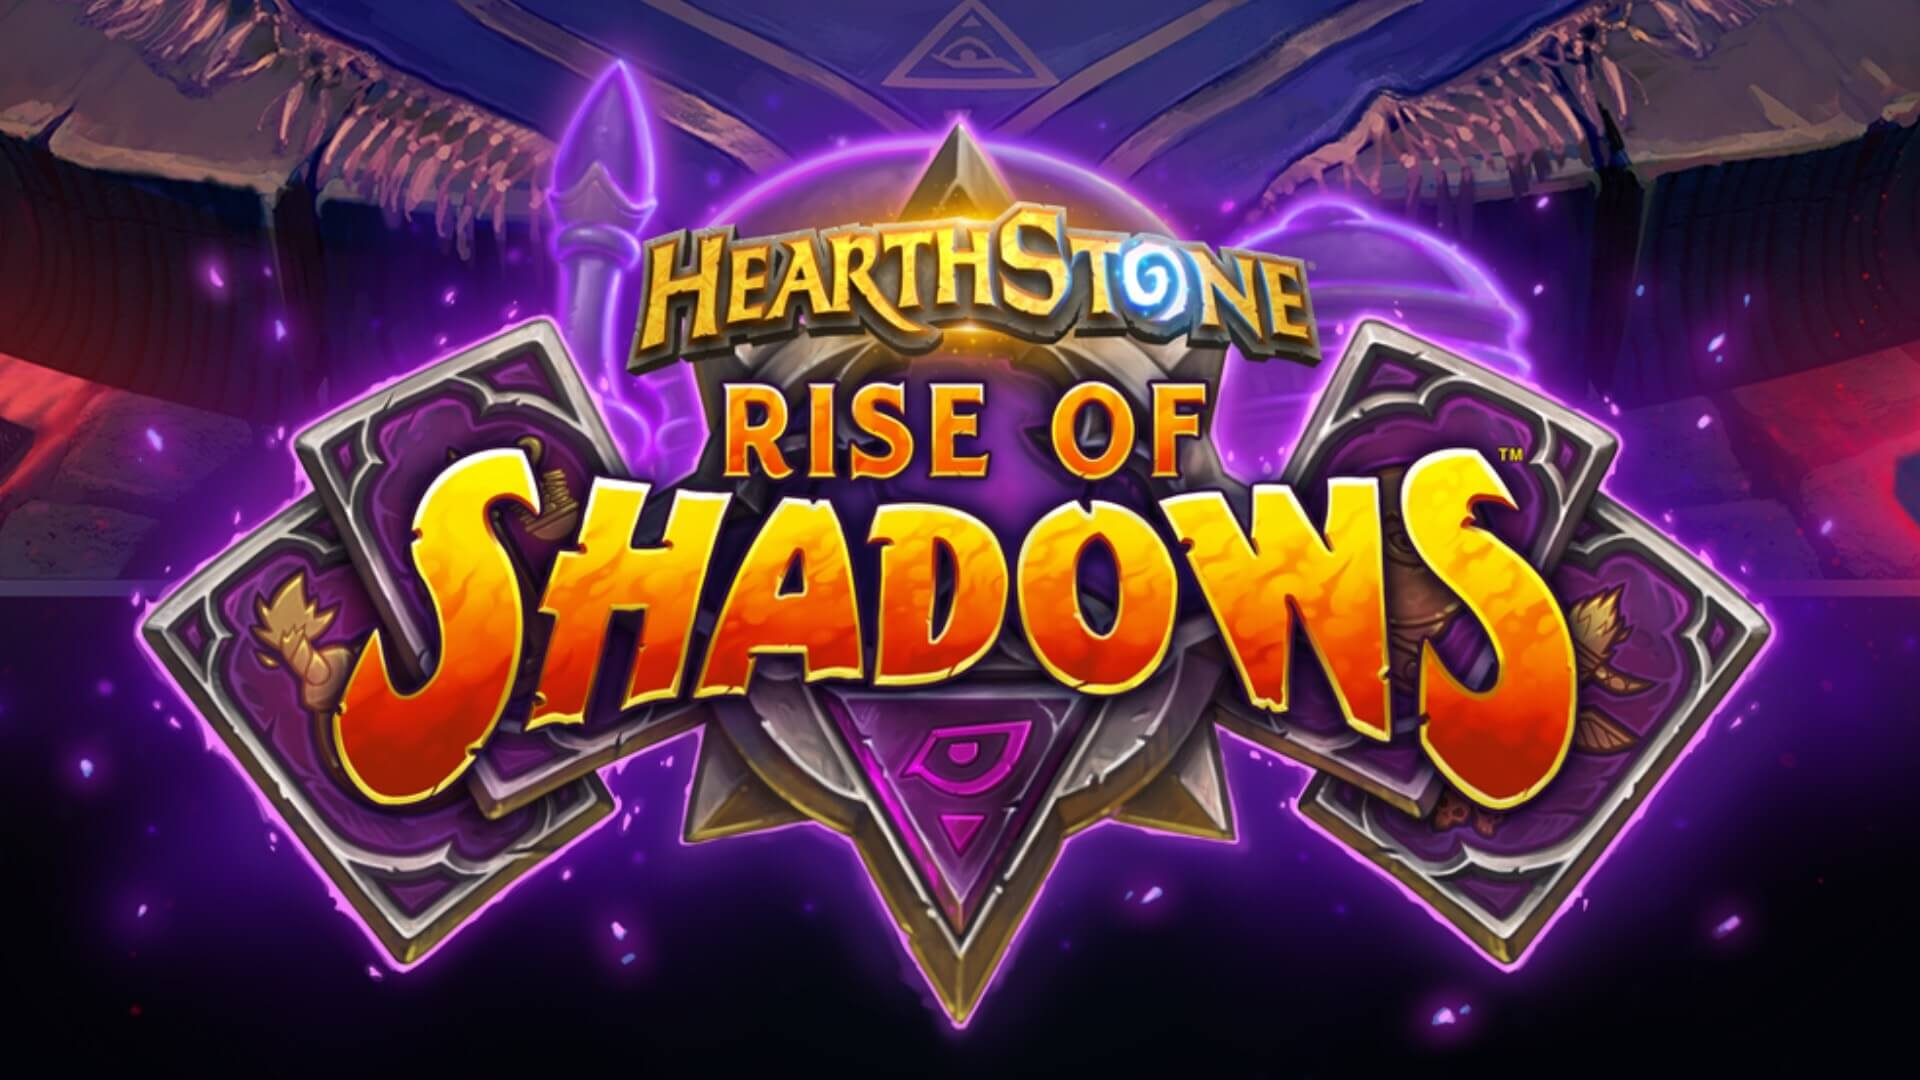 hearthstone blizzard rise of shadows